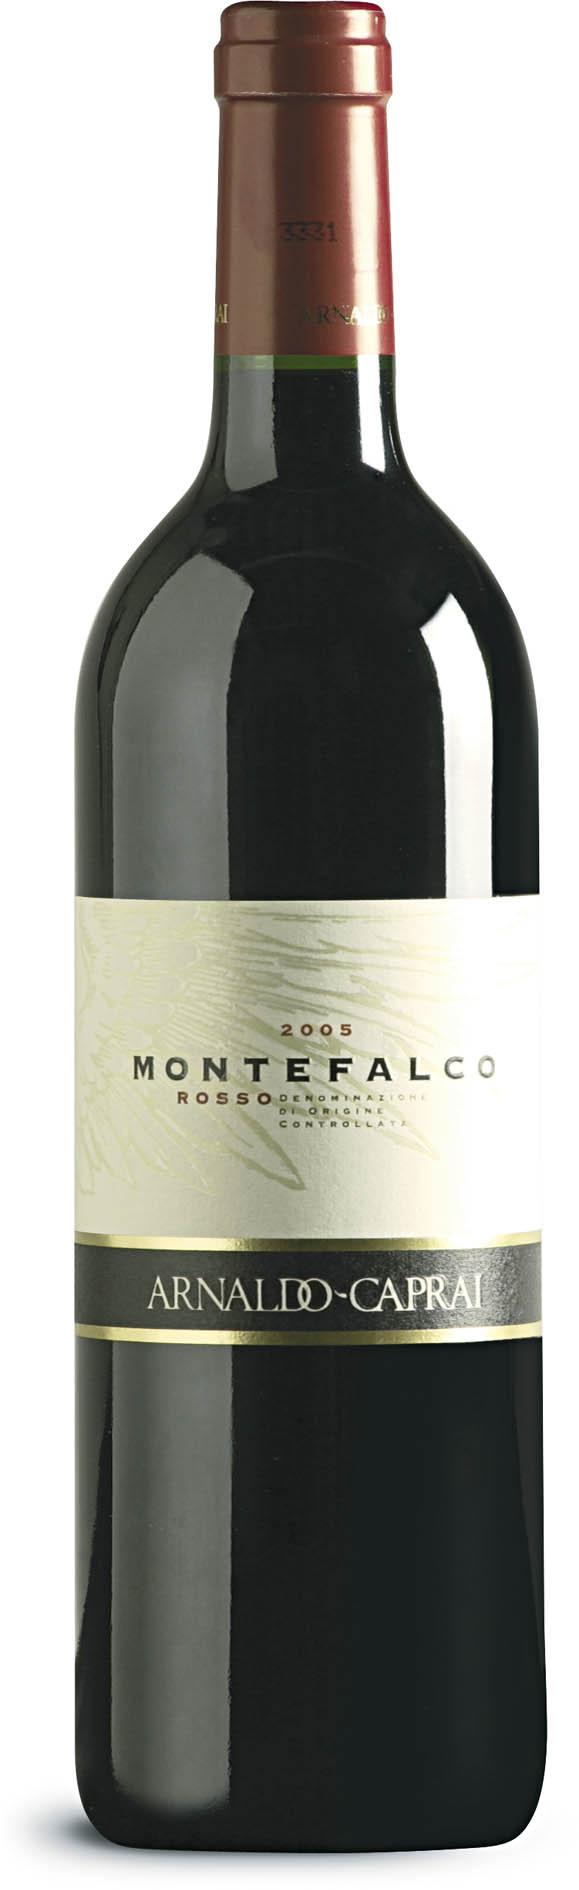 "2009 Arnaldo Caprai ""Collepiano"" Montefalco Sagrantino DOCG"